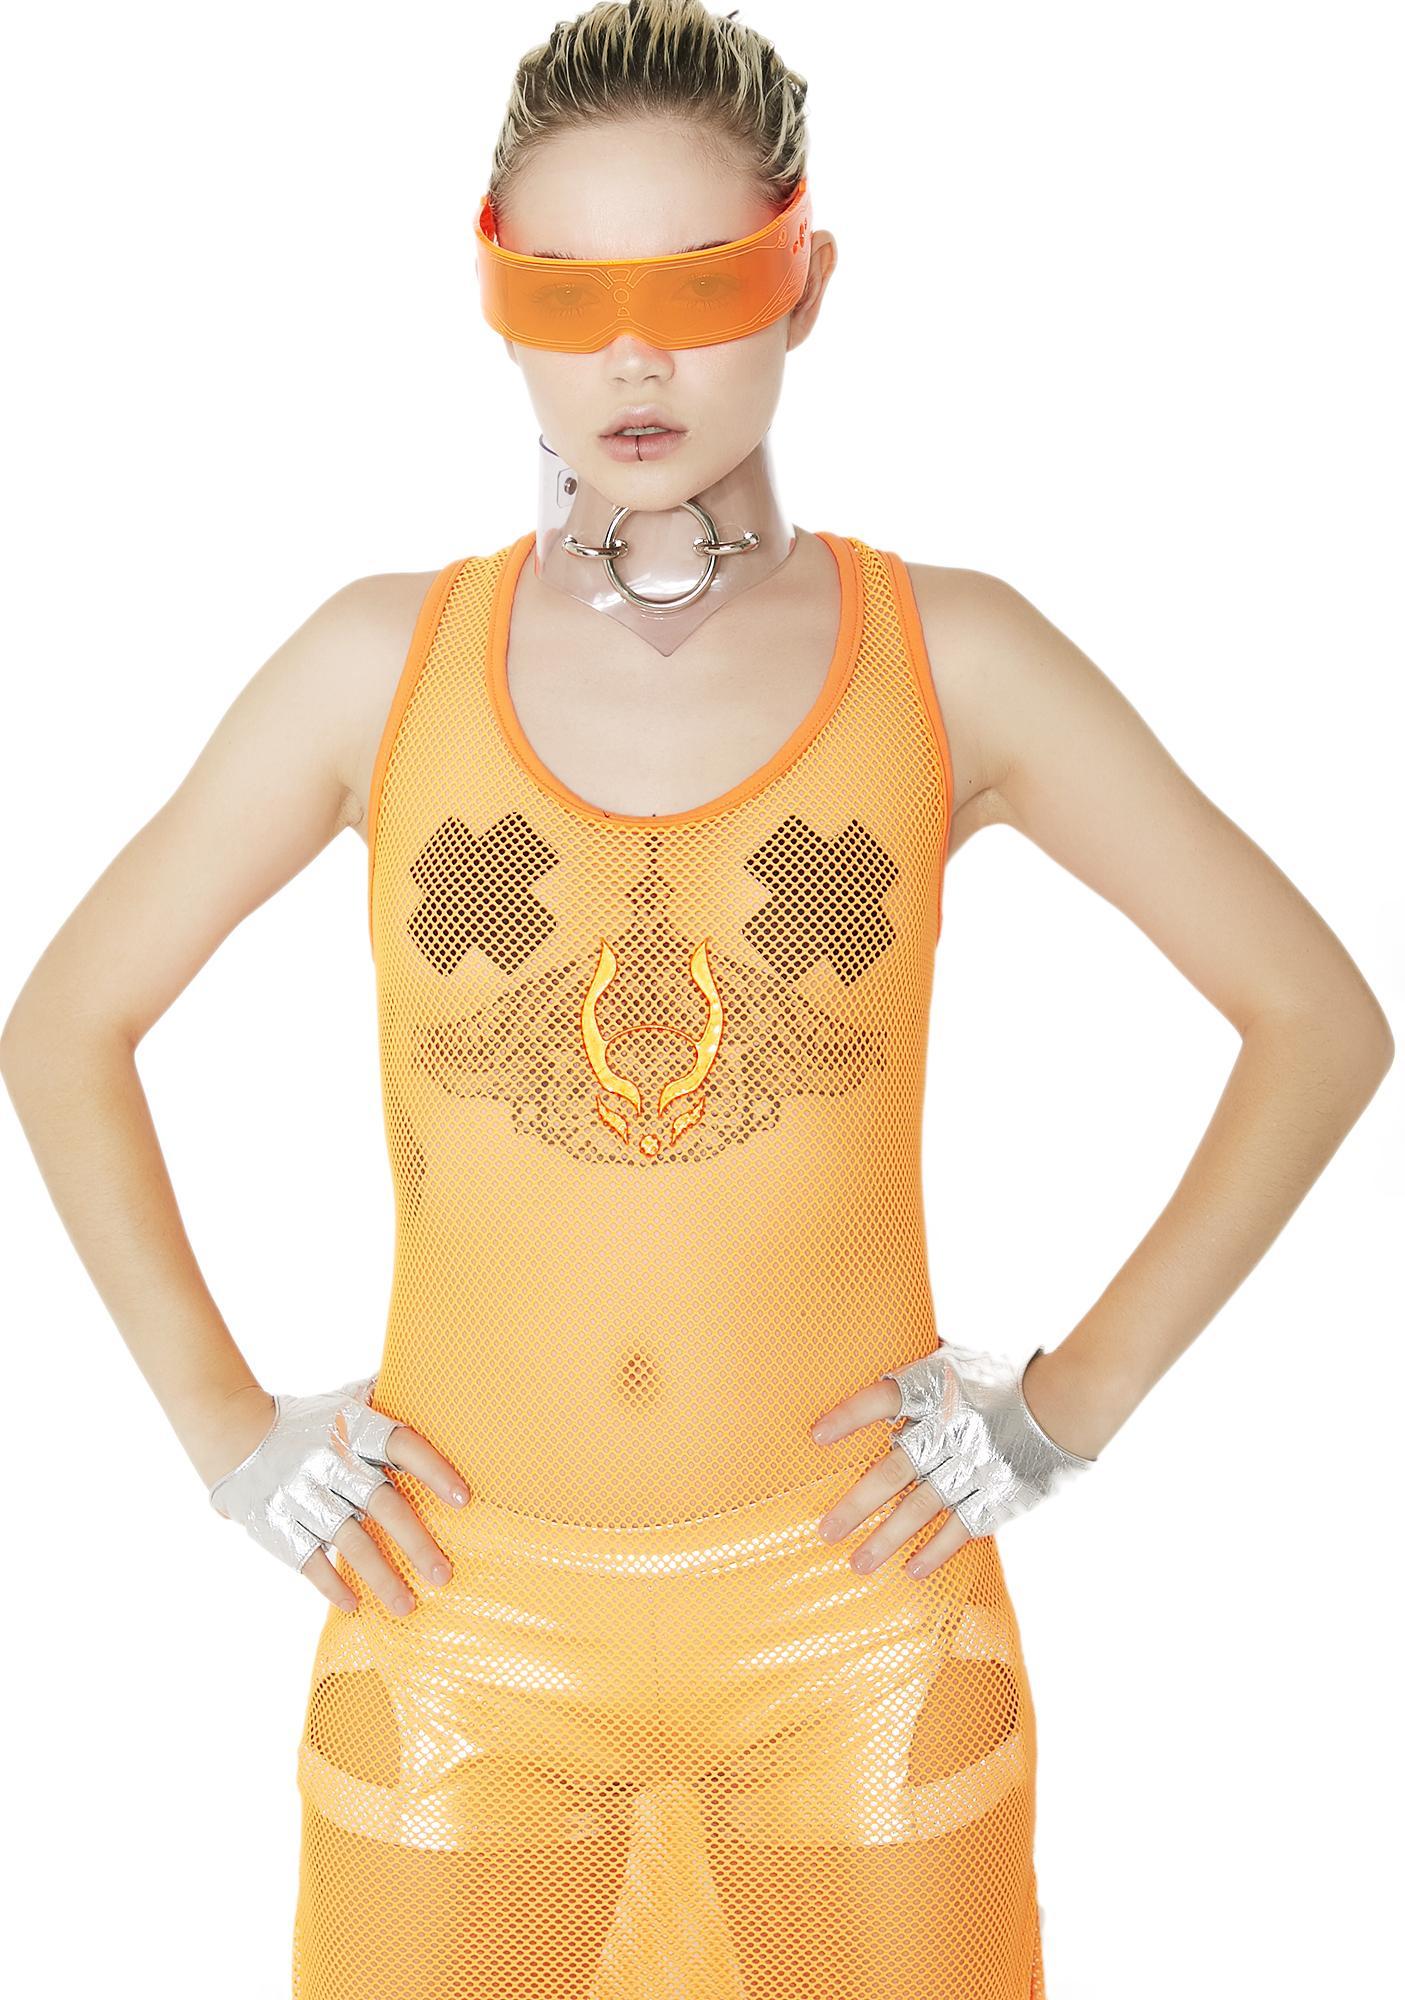 Cyberdog Rocker Mesh Maxi Dress